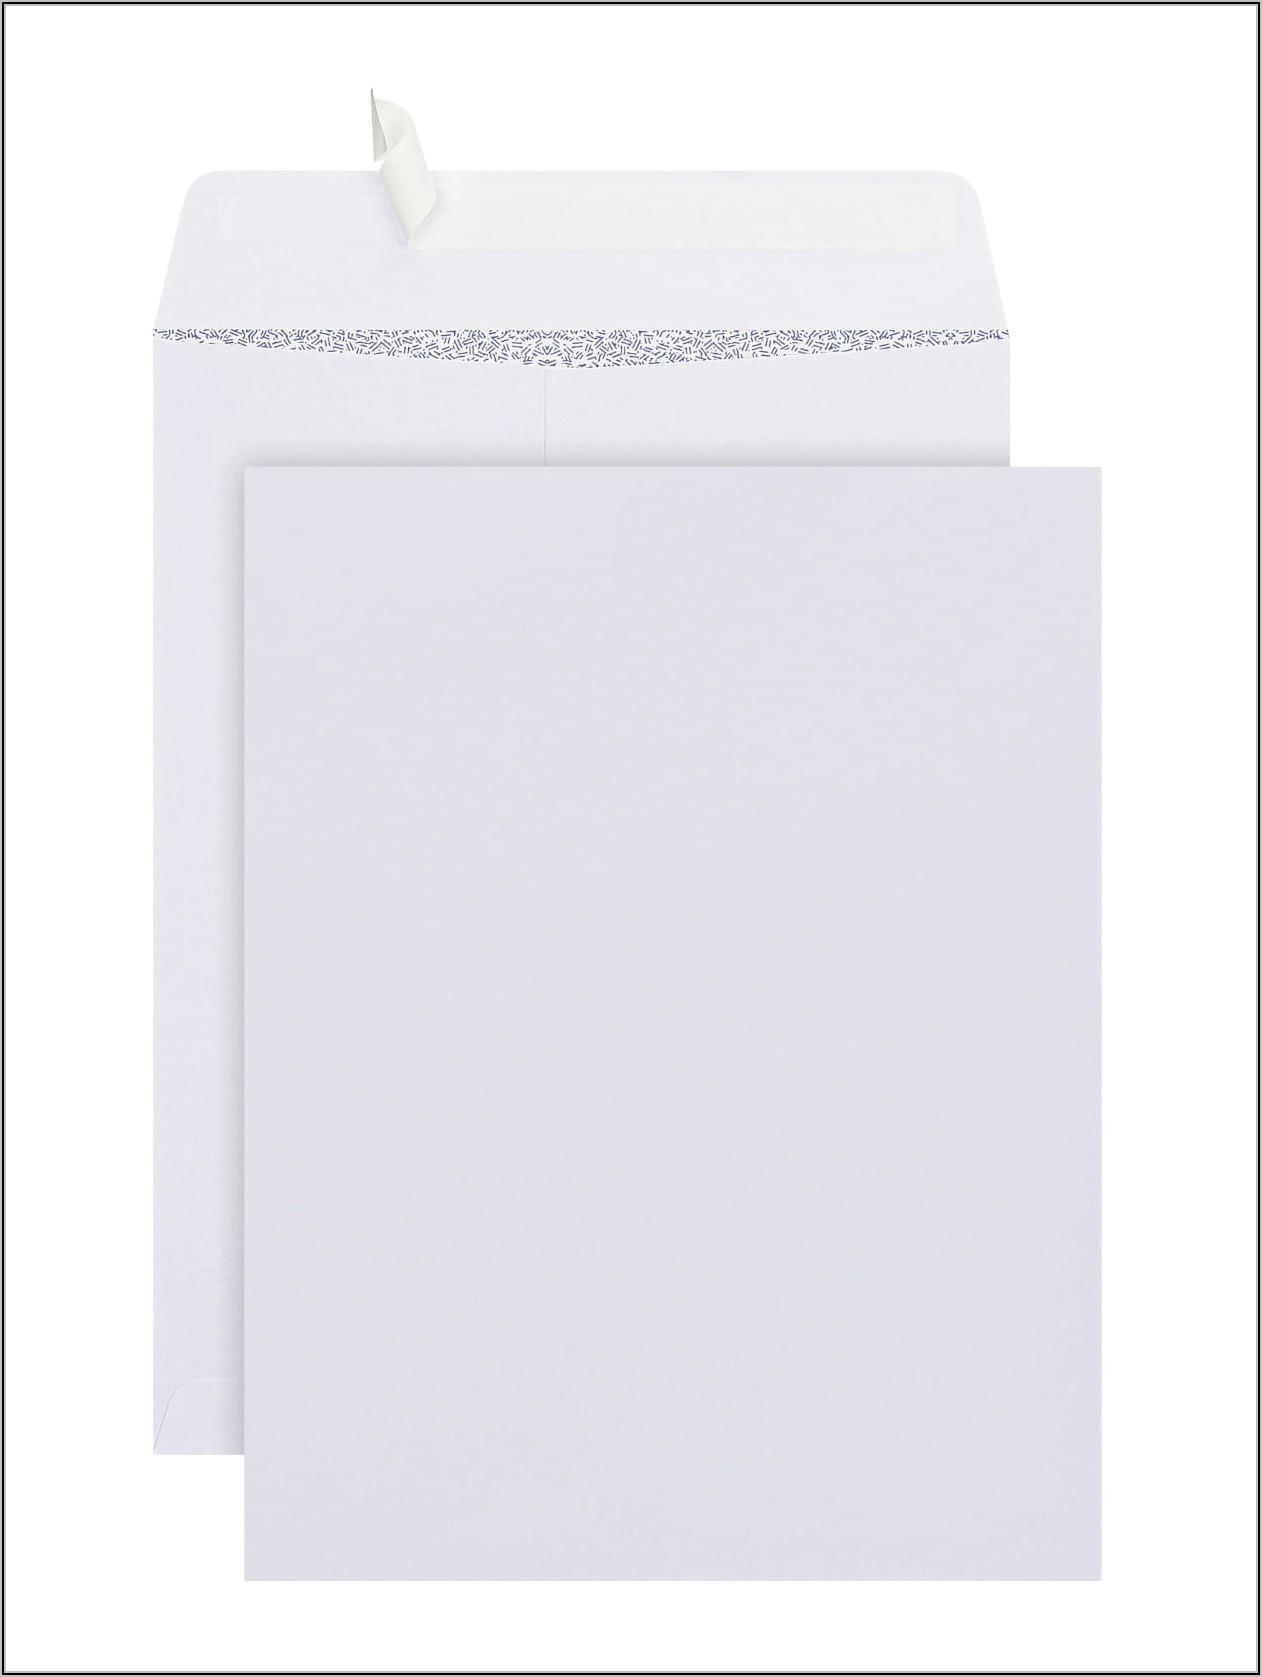 6 X 9 Booklet Envelopes Self Seal